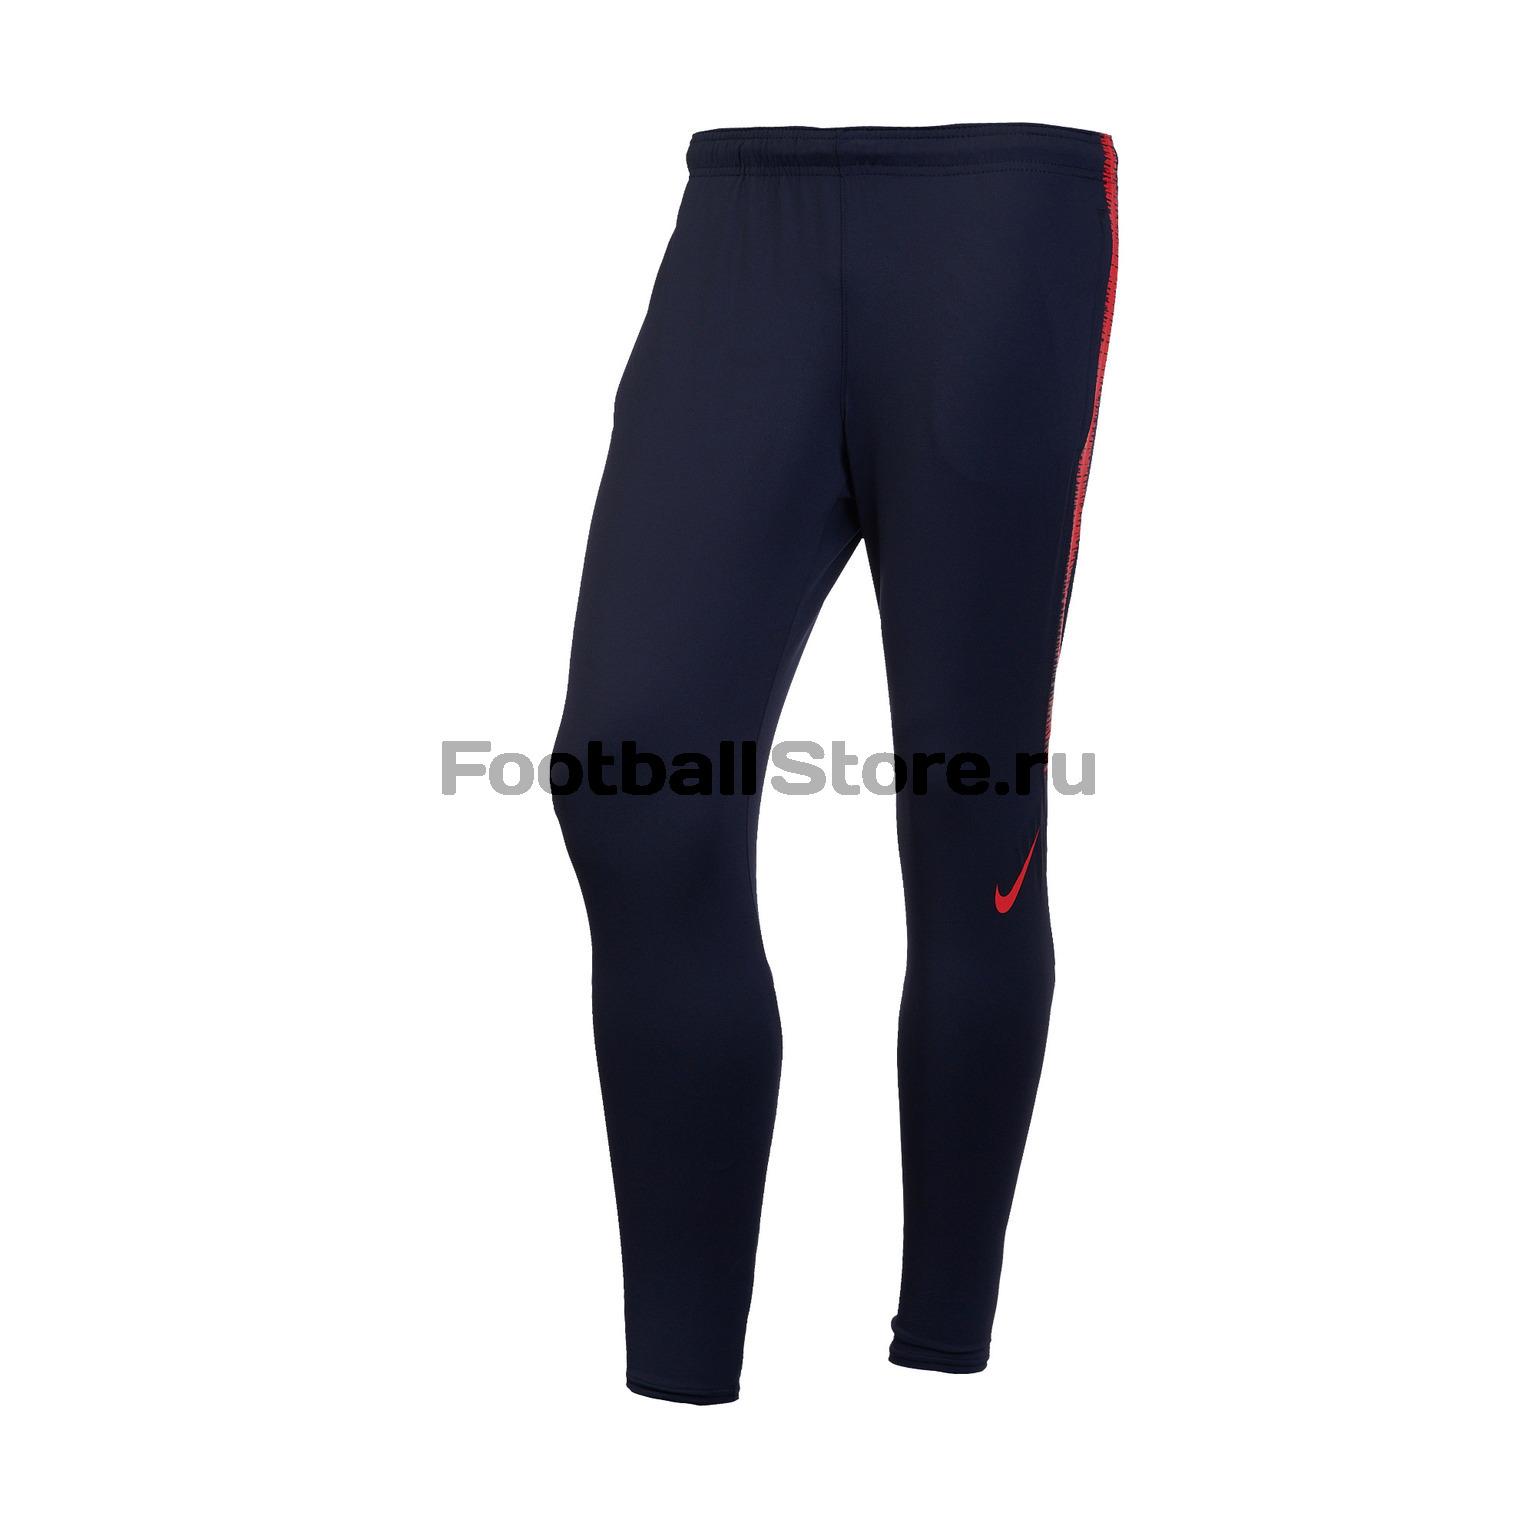 Брюки тренировочные Nike Dry Squad Pant 894645-016 nike леггинсы для девочки nike ya leg aop tght pant yth nike